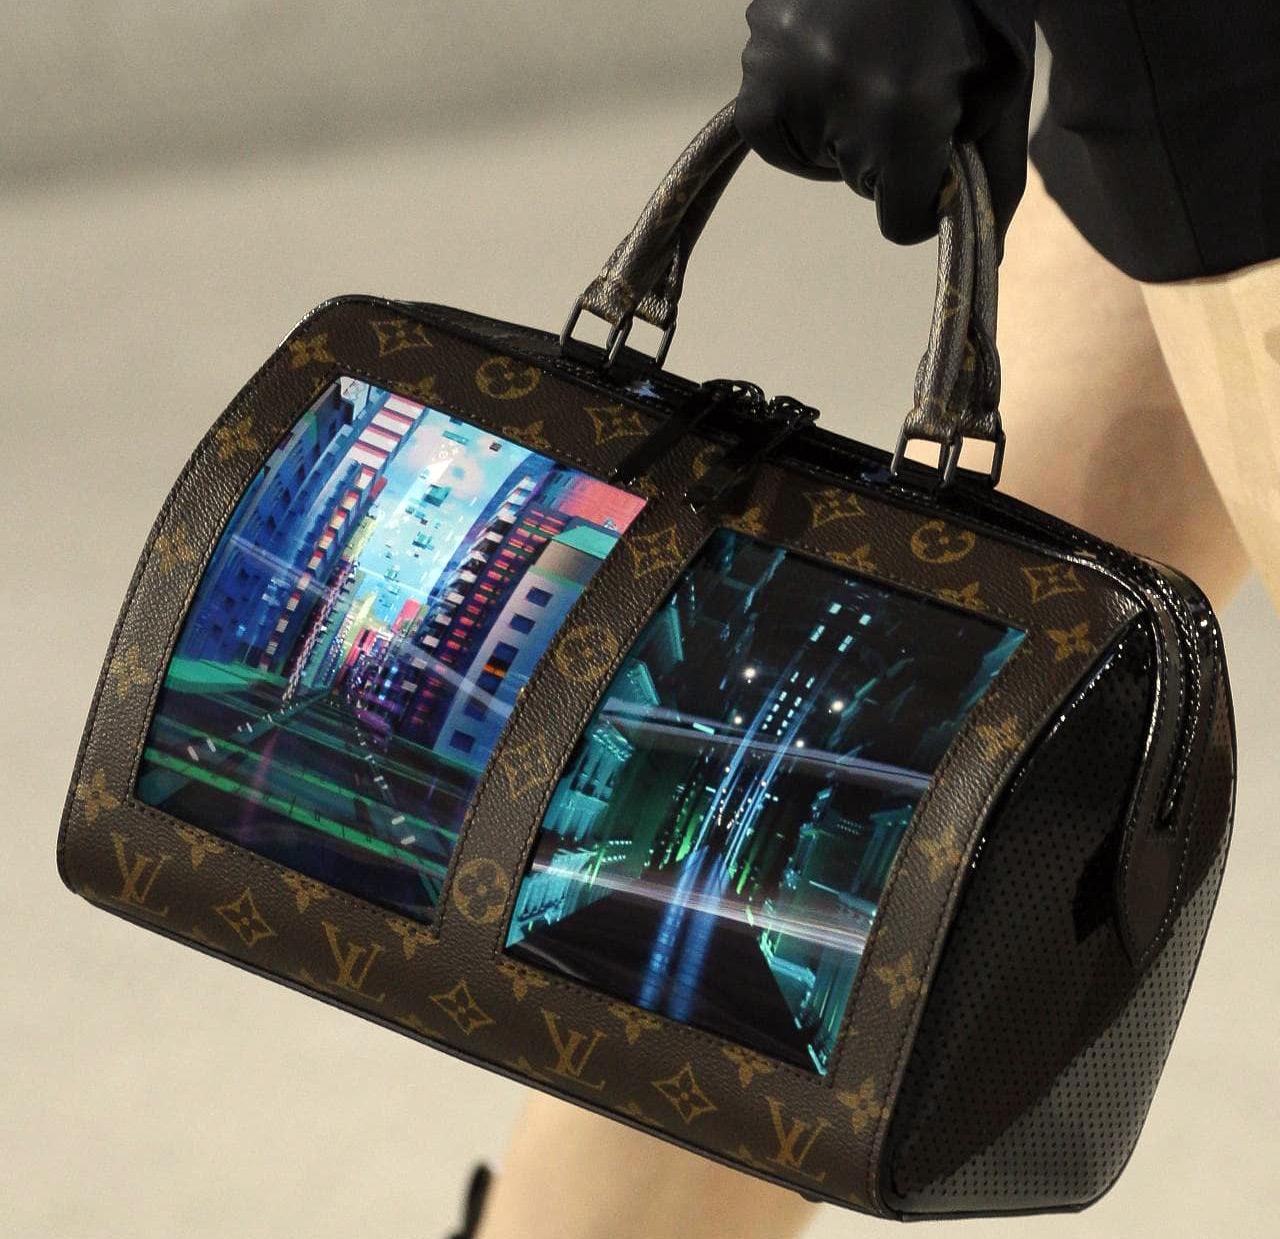 Louis Vuitton Bag Flexible AMOLED Display